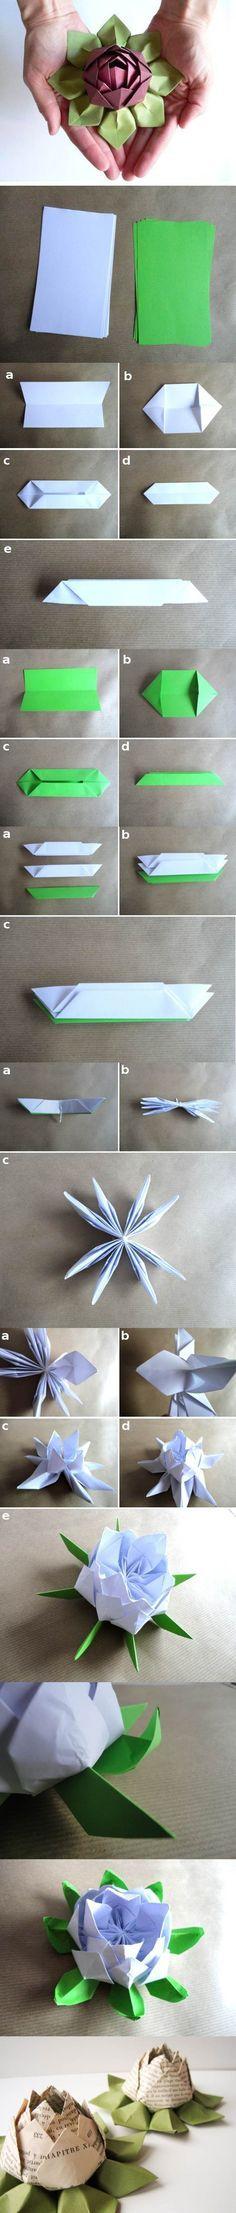 Origami Papier Rose ~ Anleitung